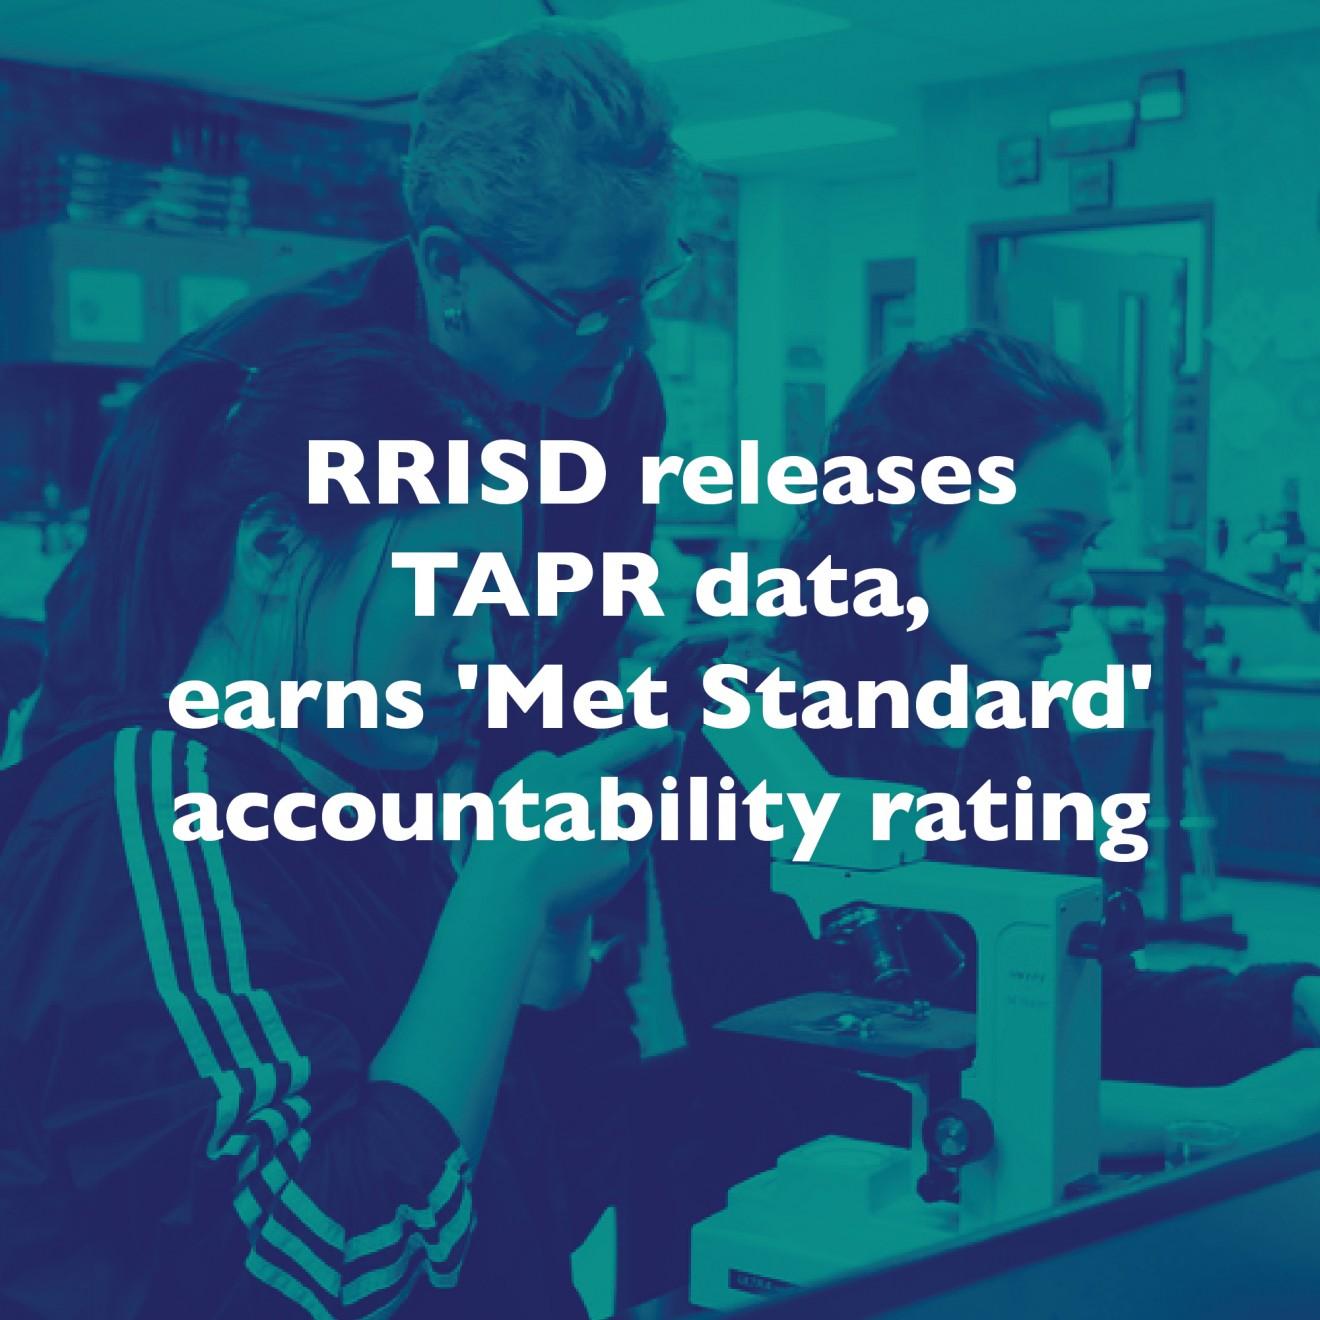 RRISD releases TAPR data, earns 'Met Standard' accountability rating